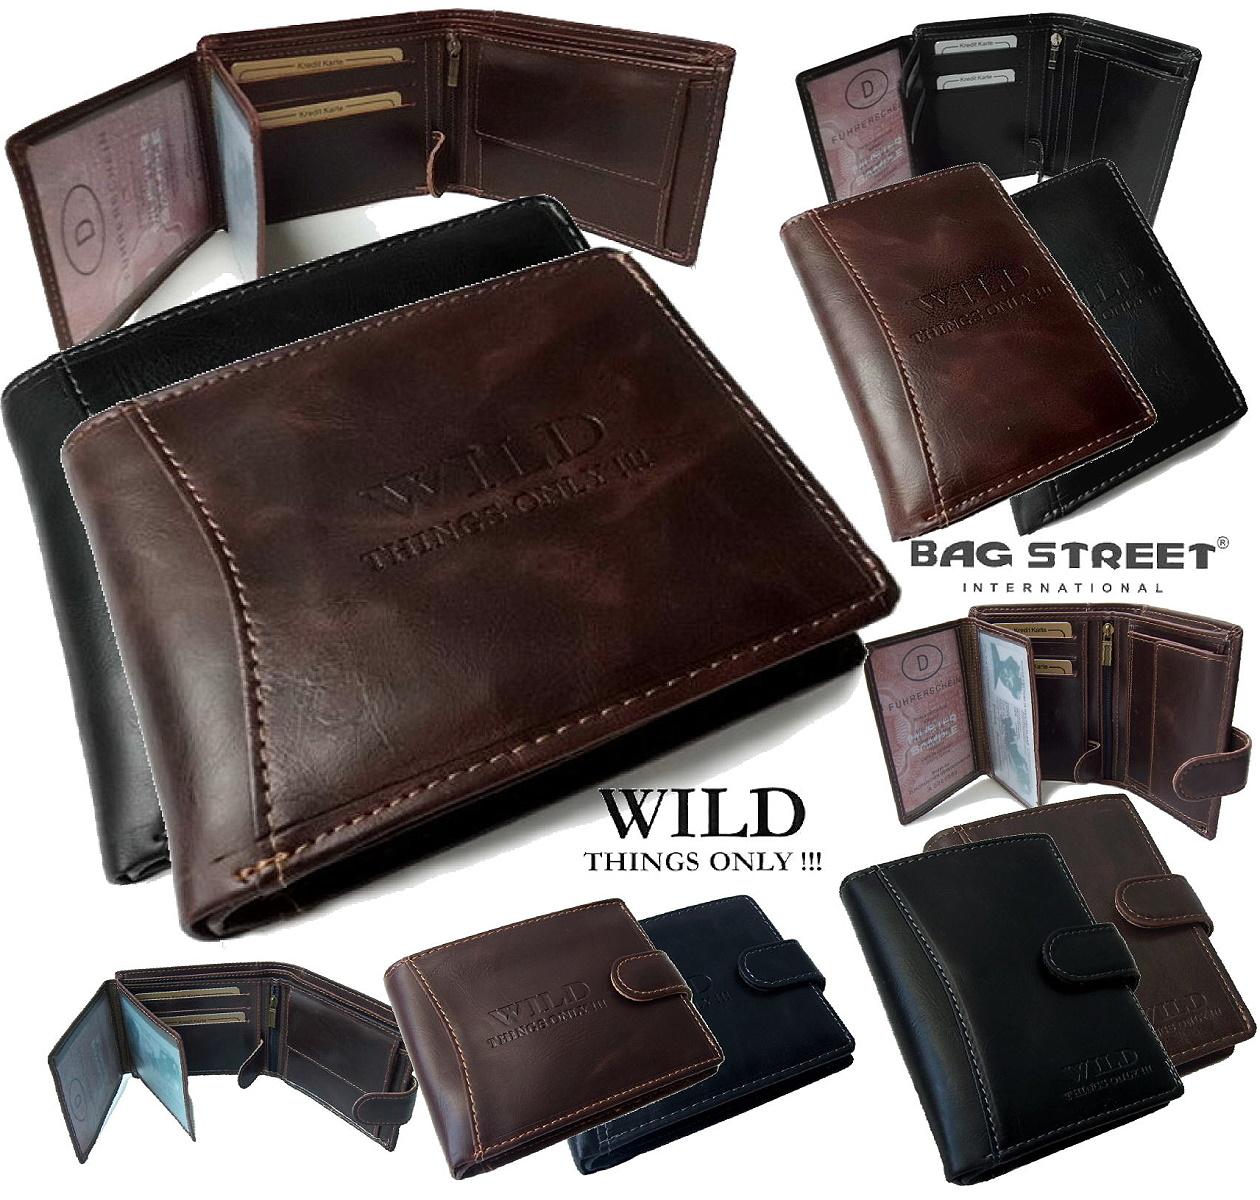 PV4* Herren Portemonnaie Leder-Look USA Geldbörse Wild Things Neu